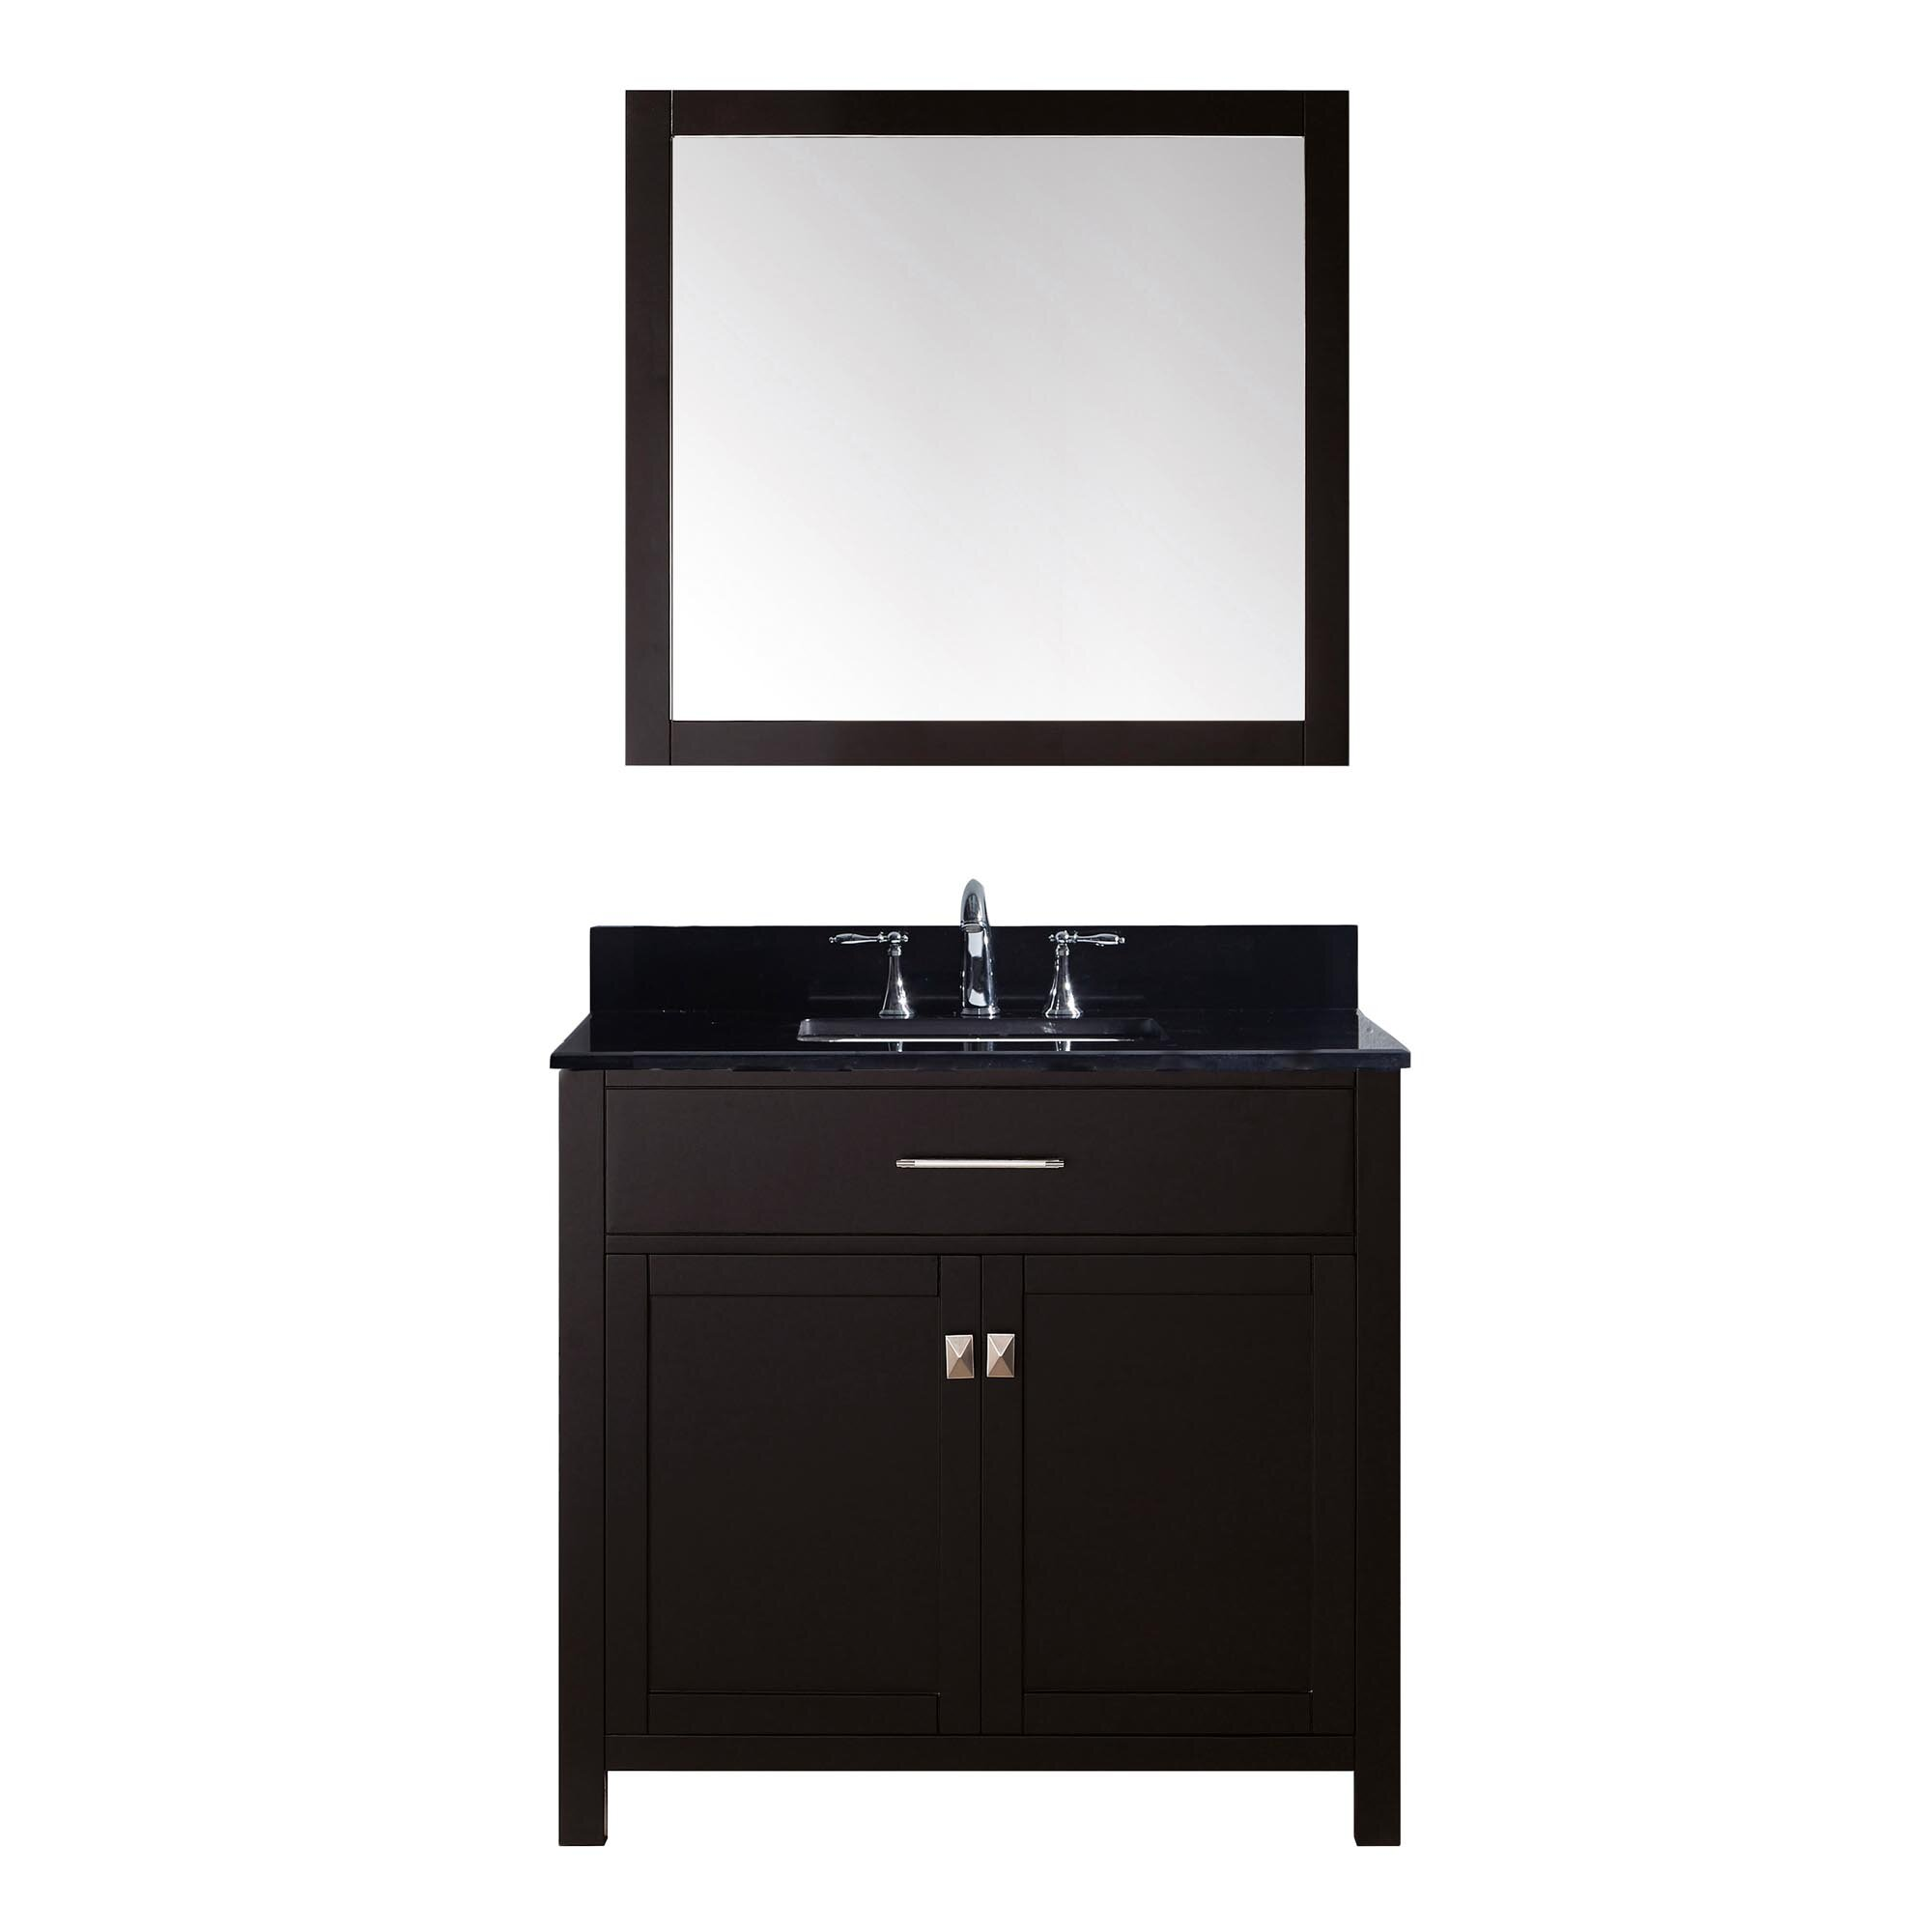 virtu caroline 36 single bathroom vanity set with black galaxy top